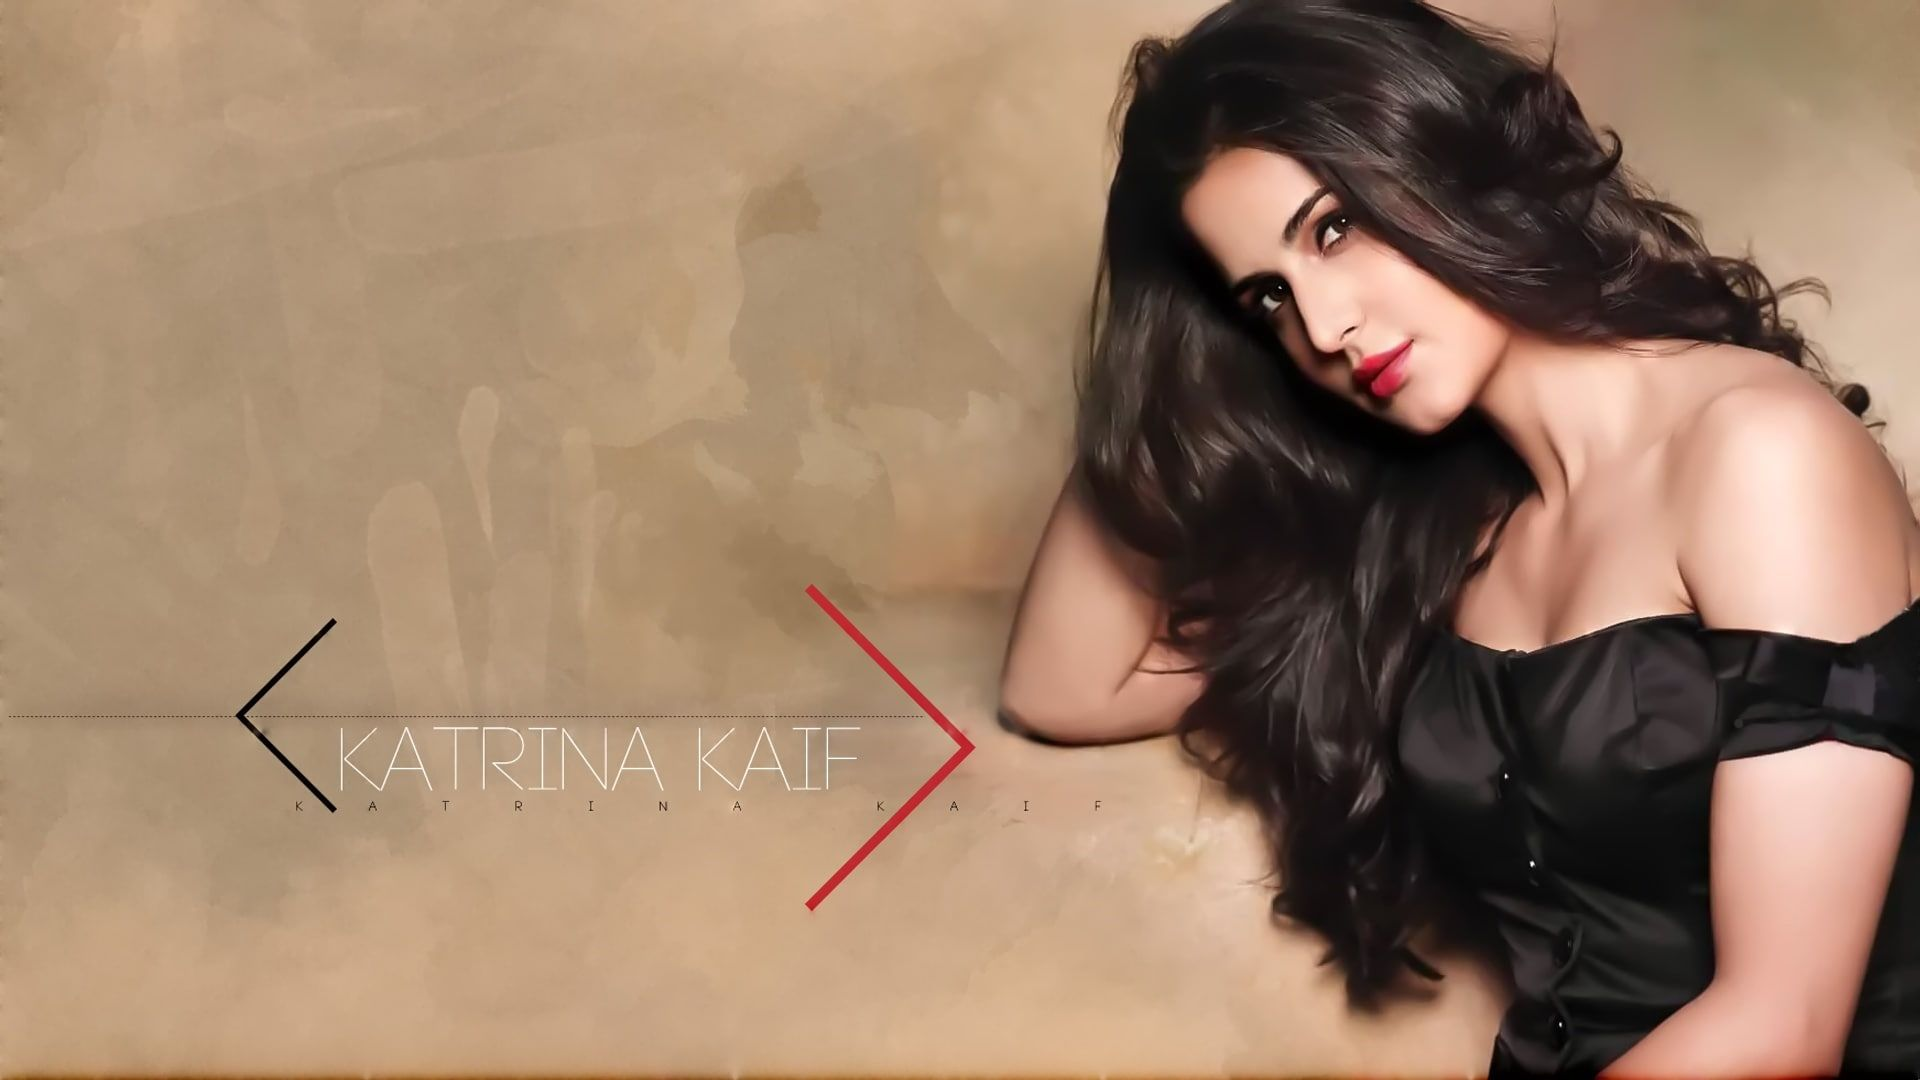 Katrina Kaif Bollywood Actresses Red Lipstick Black Dress Women 1080p Wallpaper Hdwallpaper Deskto Katrina Kaif Katrina Kaif Photo Katrina Kaif Wallpapers